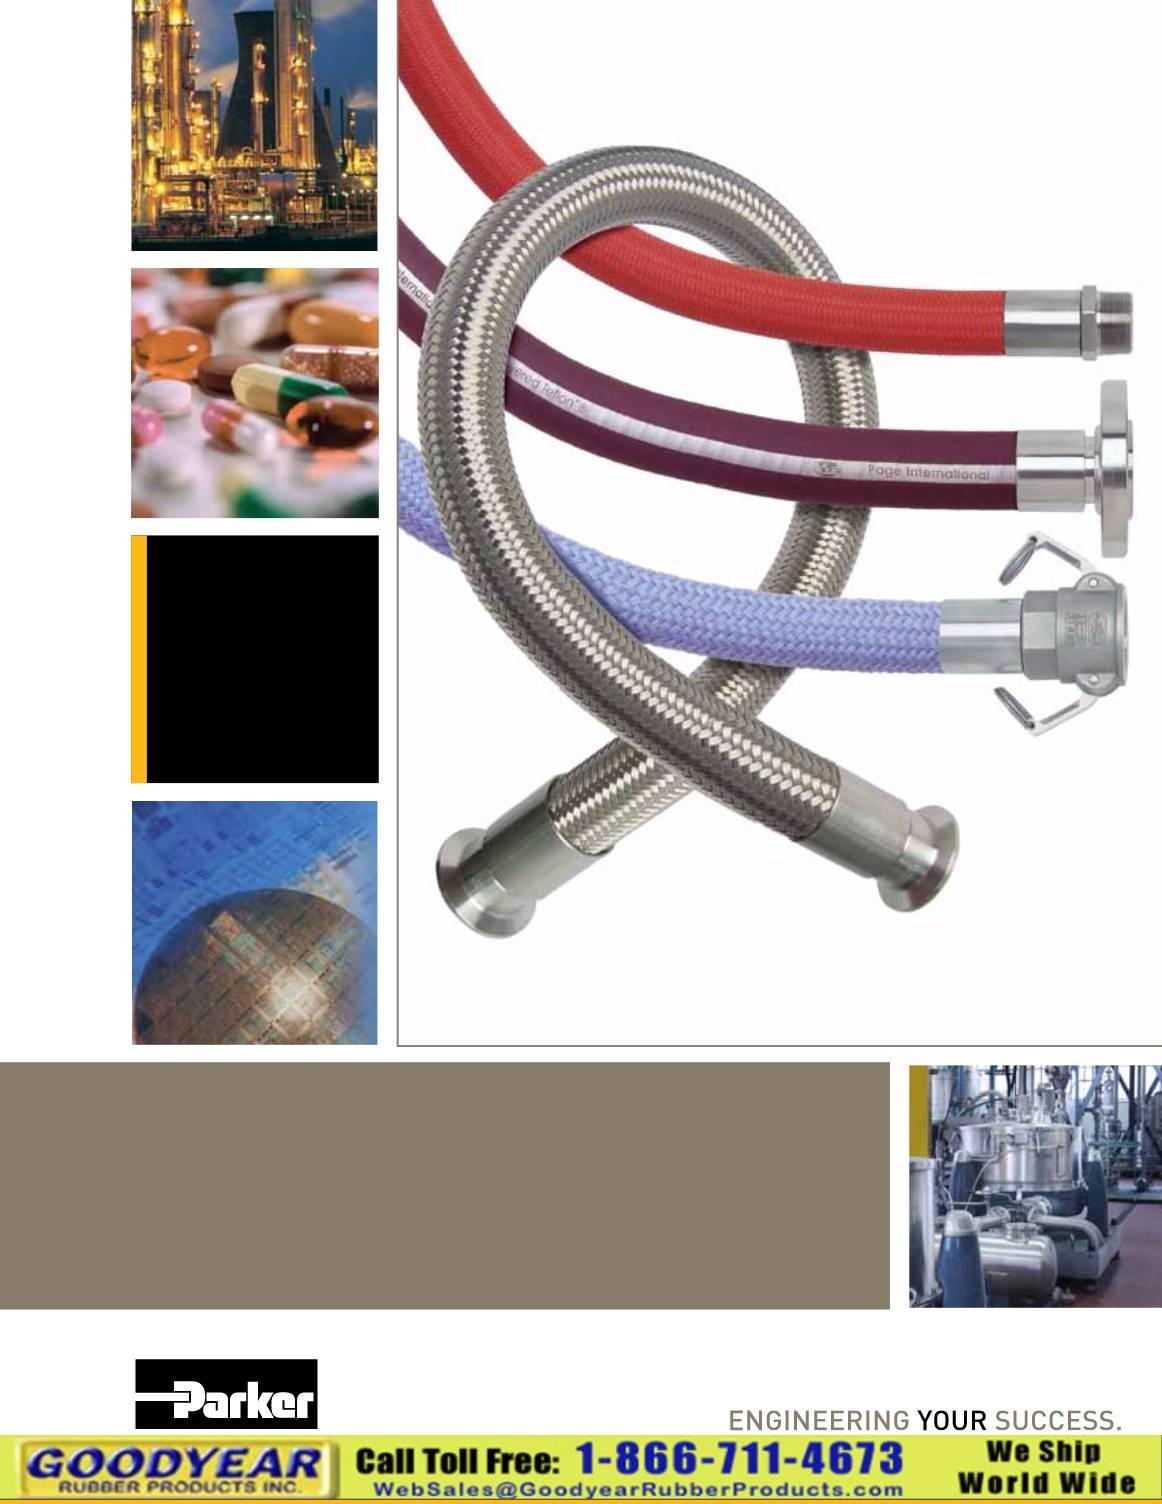 Parker Page Fluoropolymer Hose